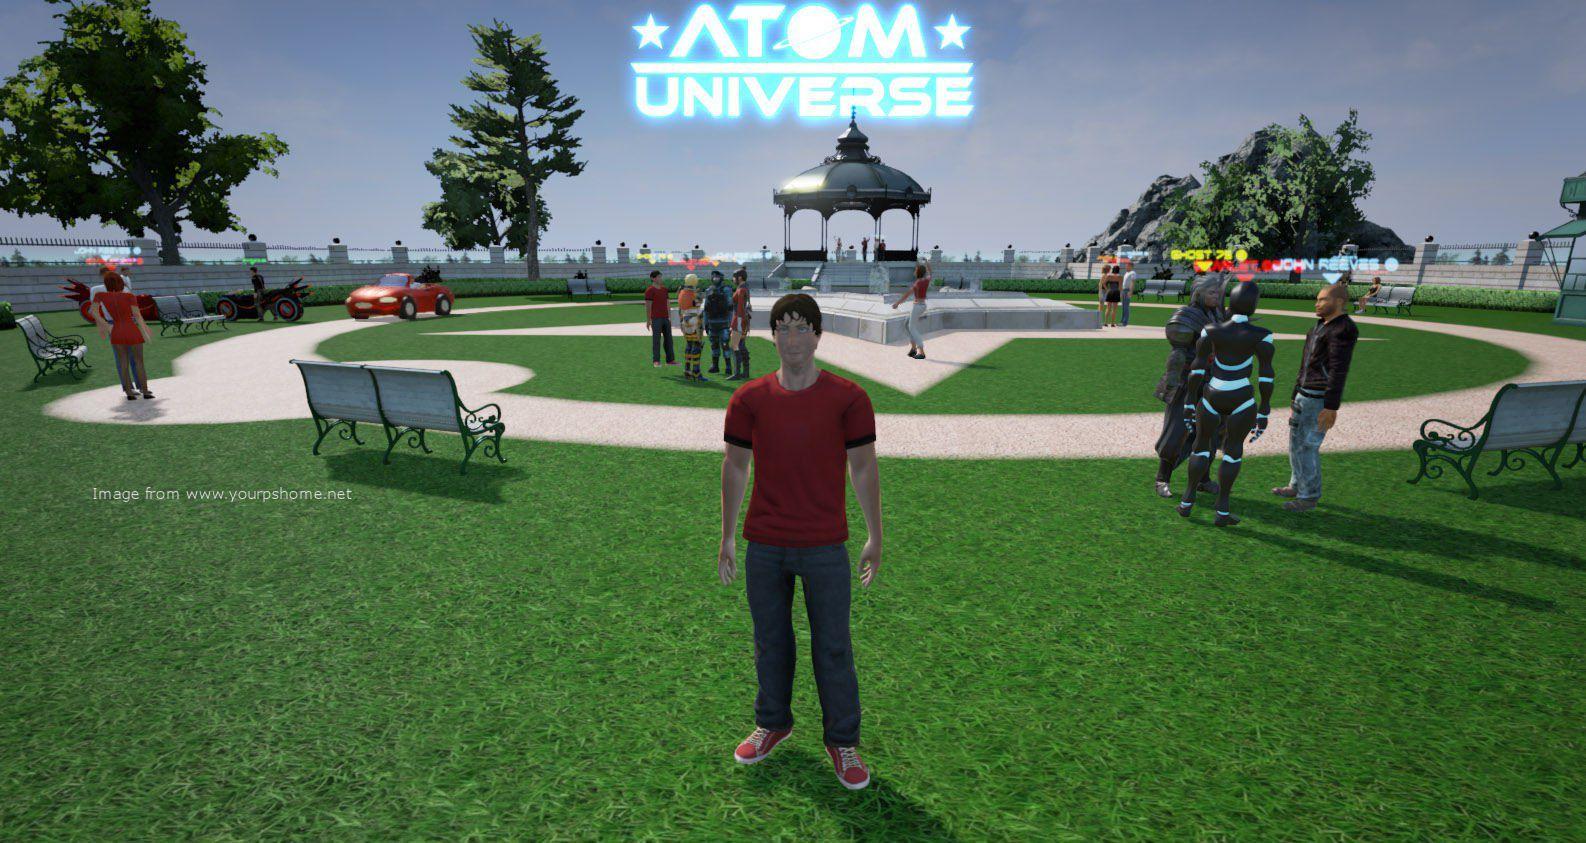 Karen Talks To Atom Republic About Atom Universe, kwoman32, Nov 30, 2014, 4:55 PM, YourPSHome.net, jpg, PublicParkCrowd-copy.jpg